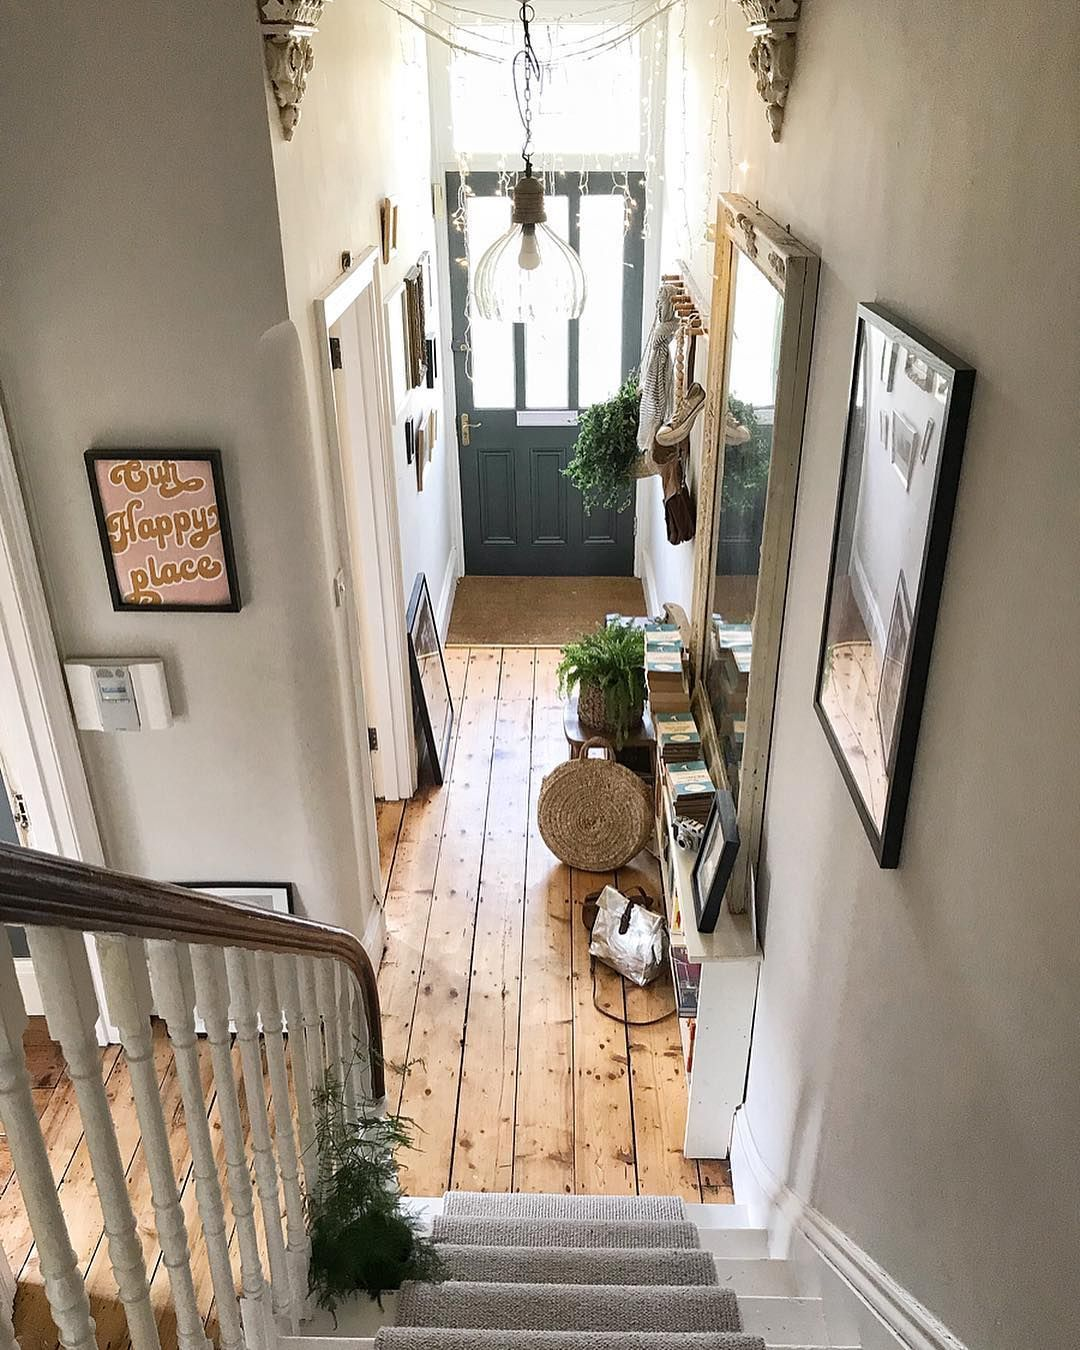 Creative Hallwayideas: 8184 Likes 43 Comments Dee Interior Design (@deecampling